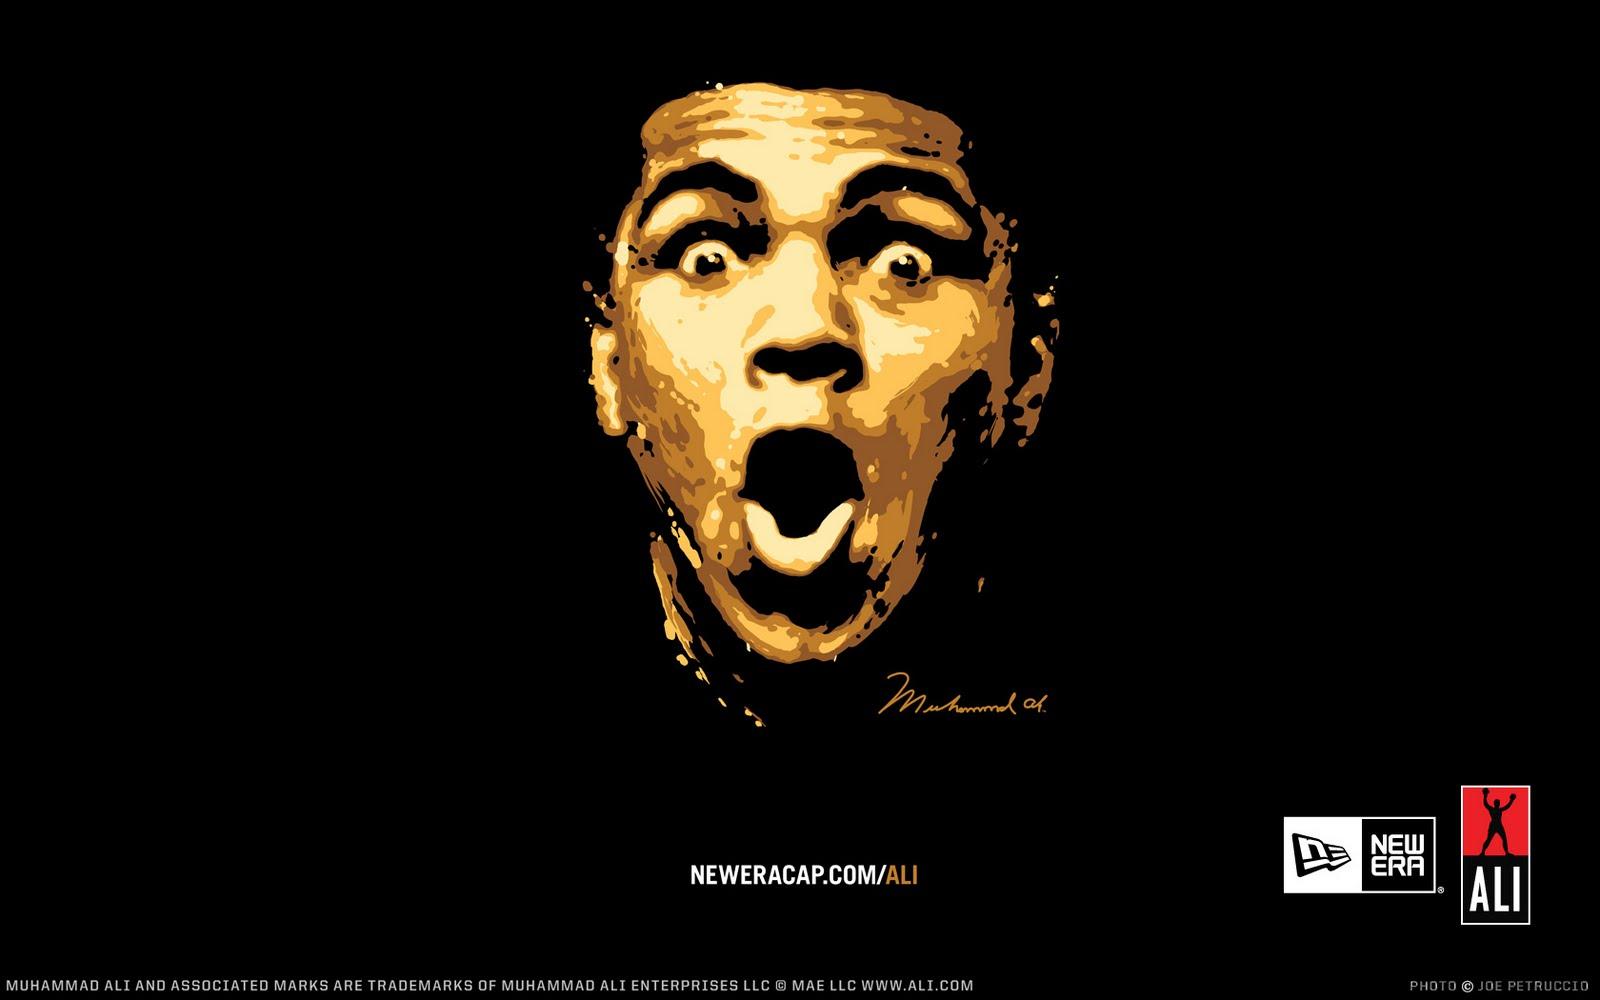 Muhammad Ali Wallpaper Background 11 Wallpaper 1600x1000